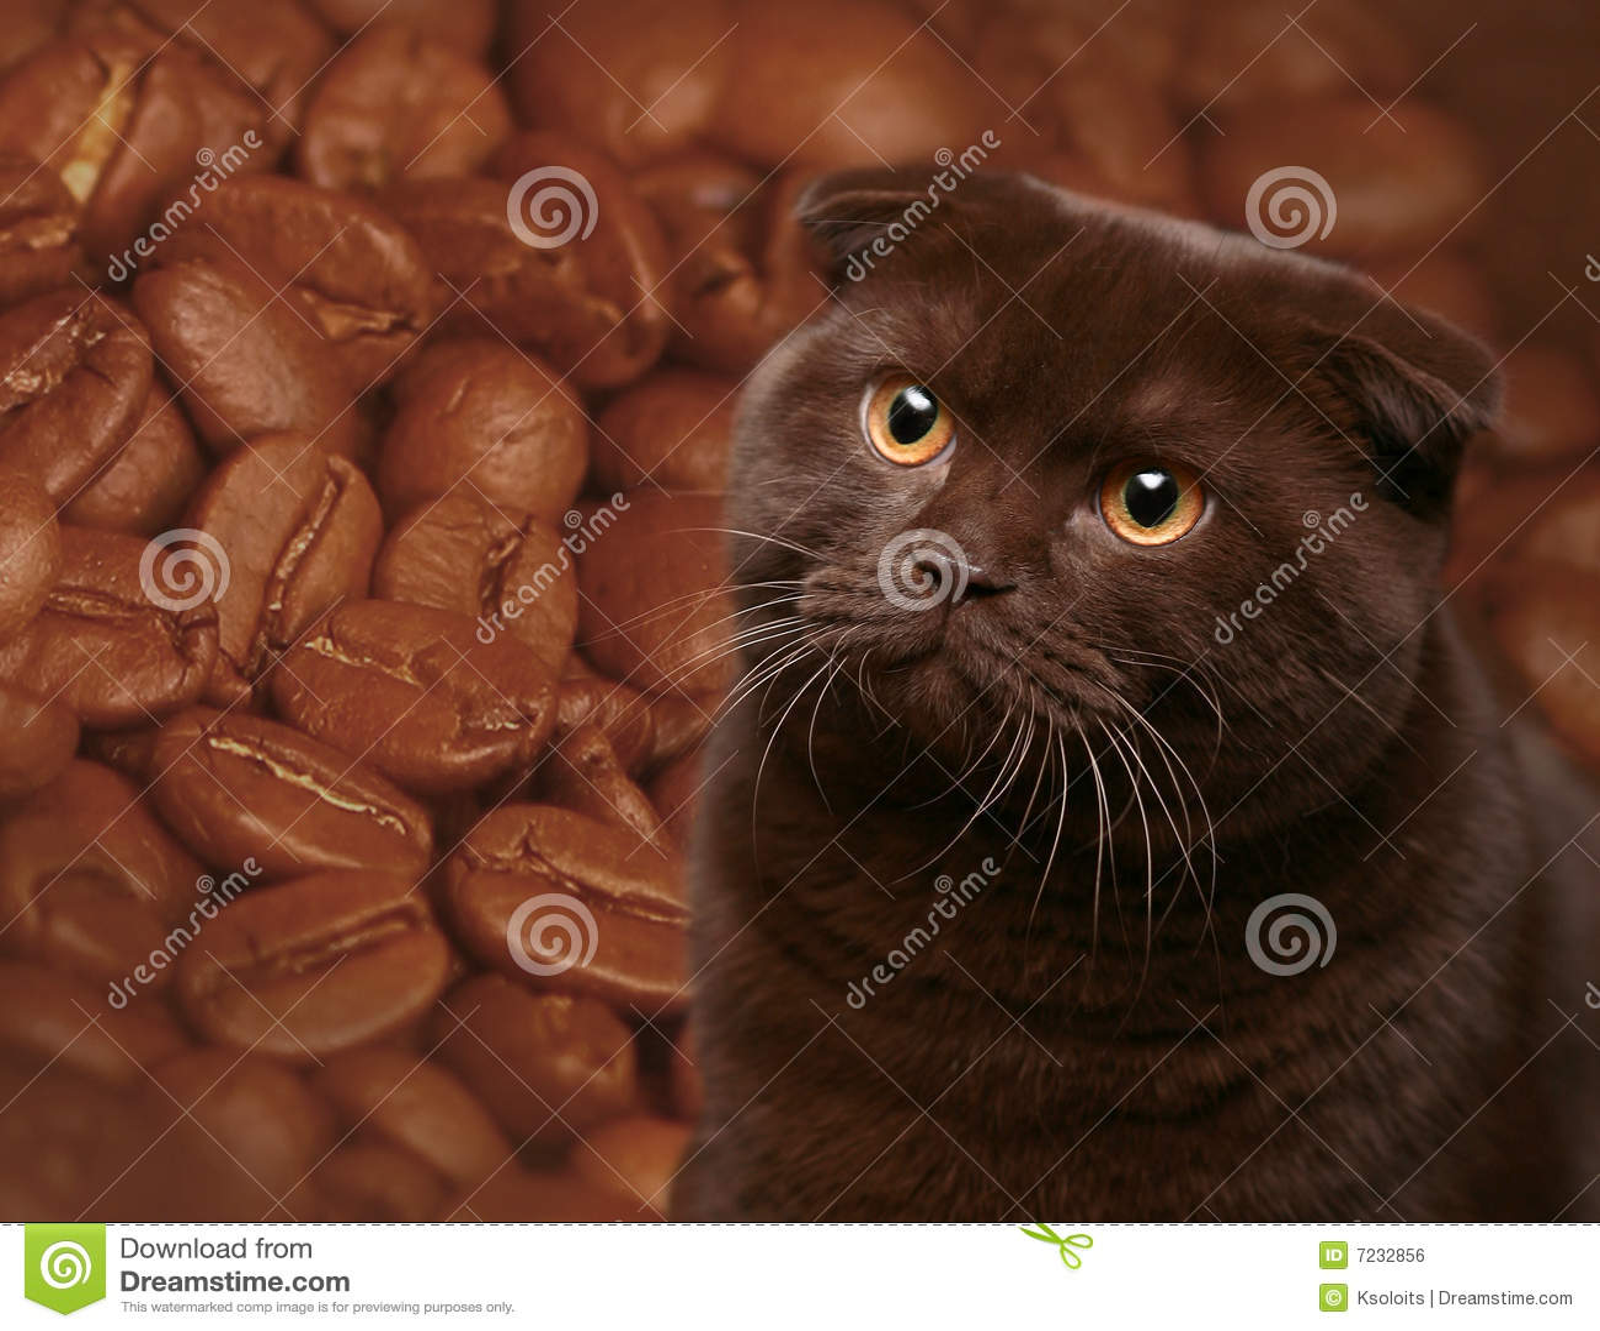 Chocolate Cat Royalty Free Stock Image - Image: 7232856